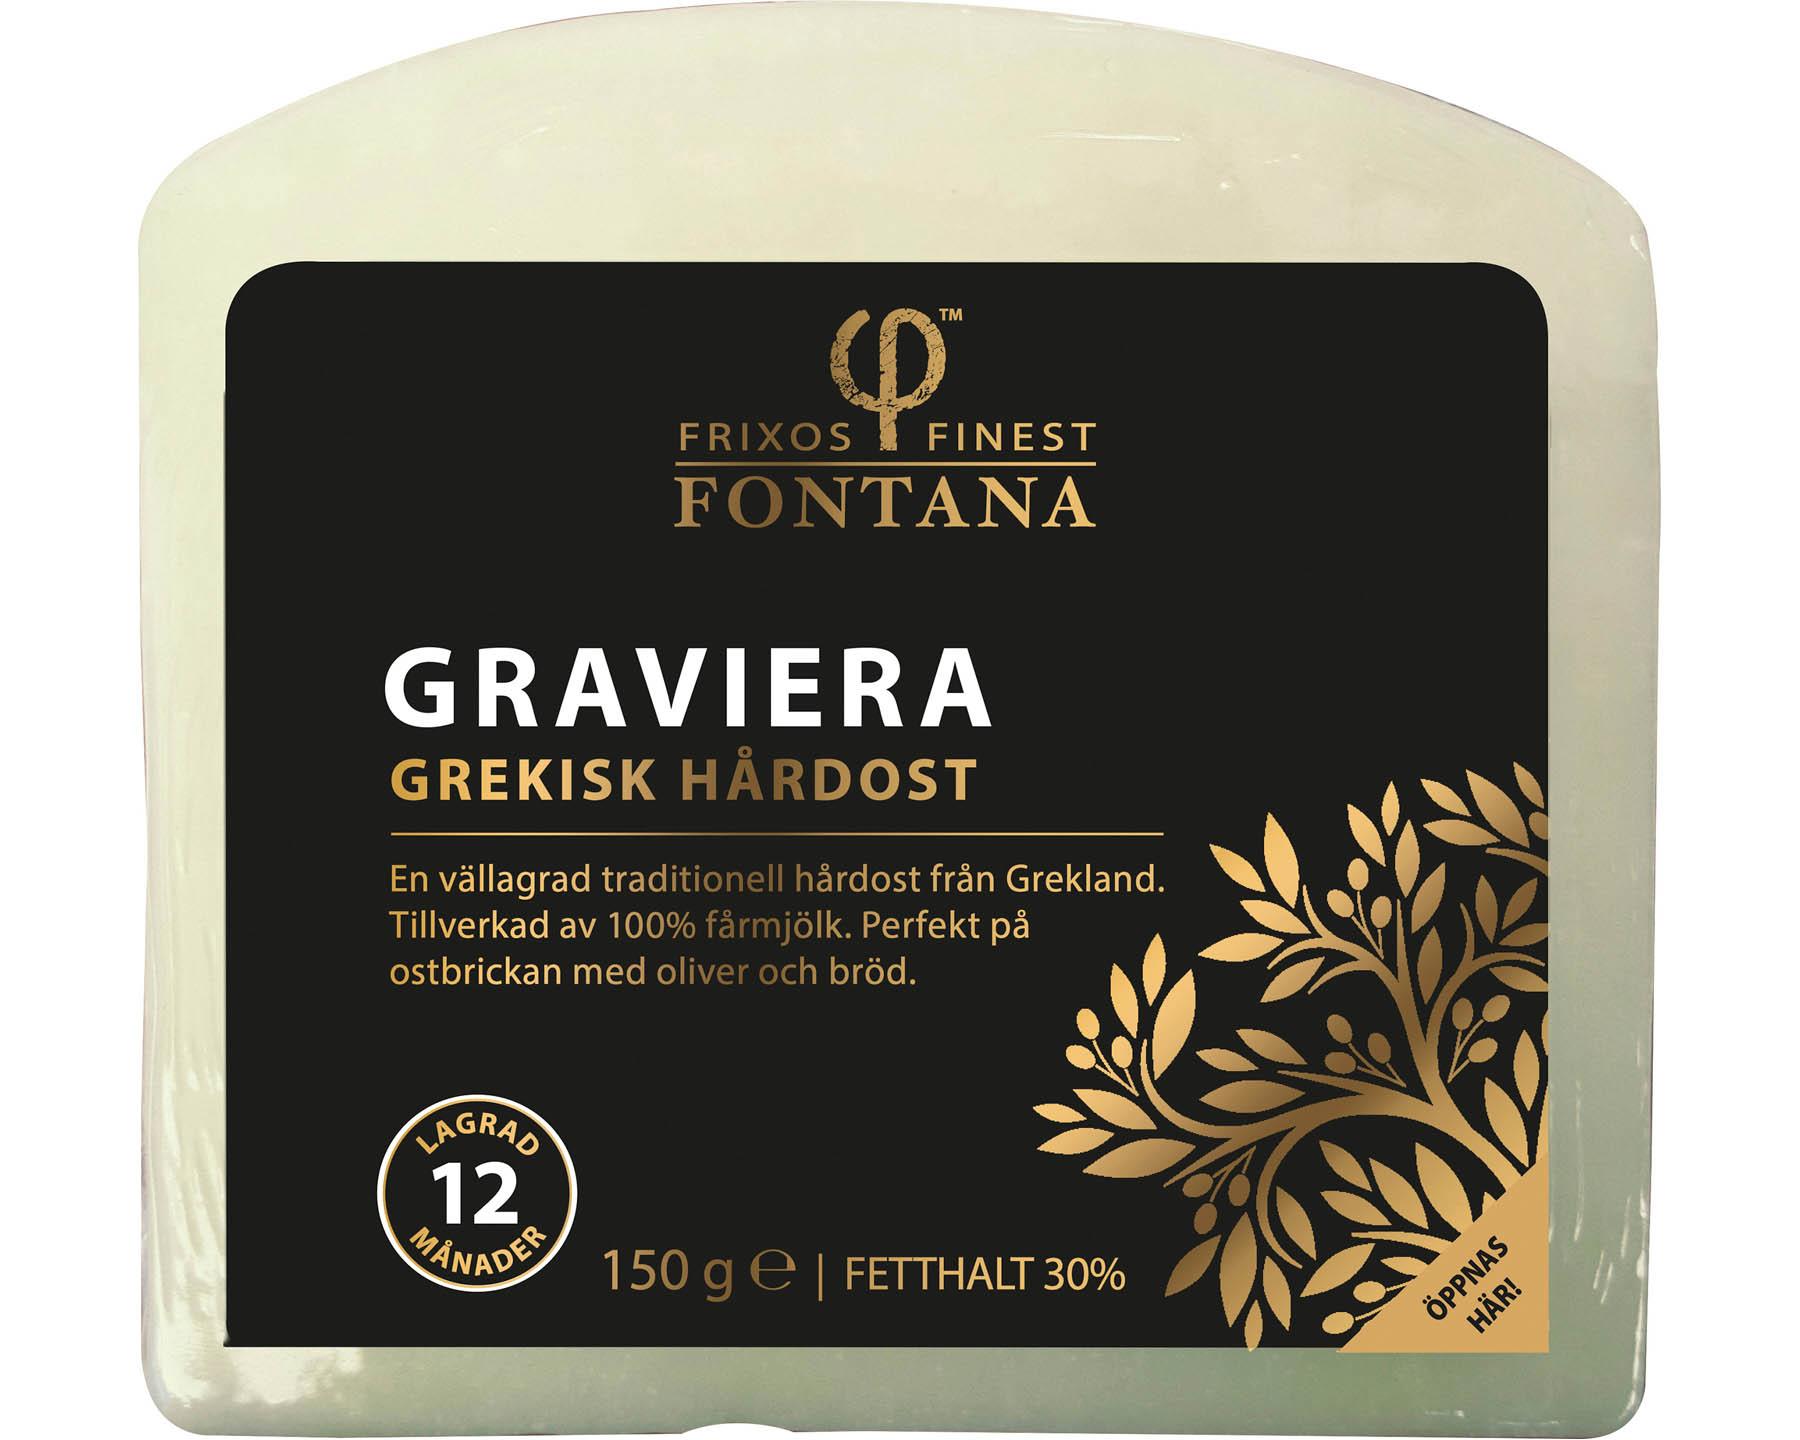 Fontana Frixos Finest Graviera